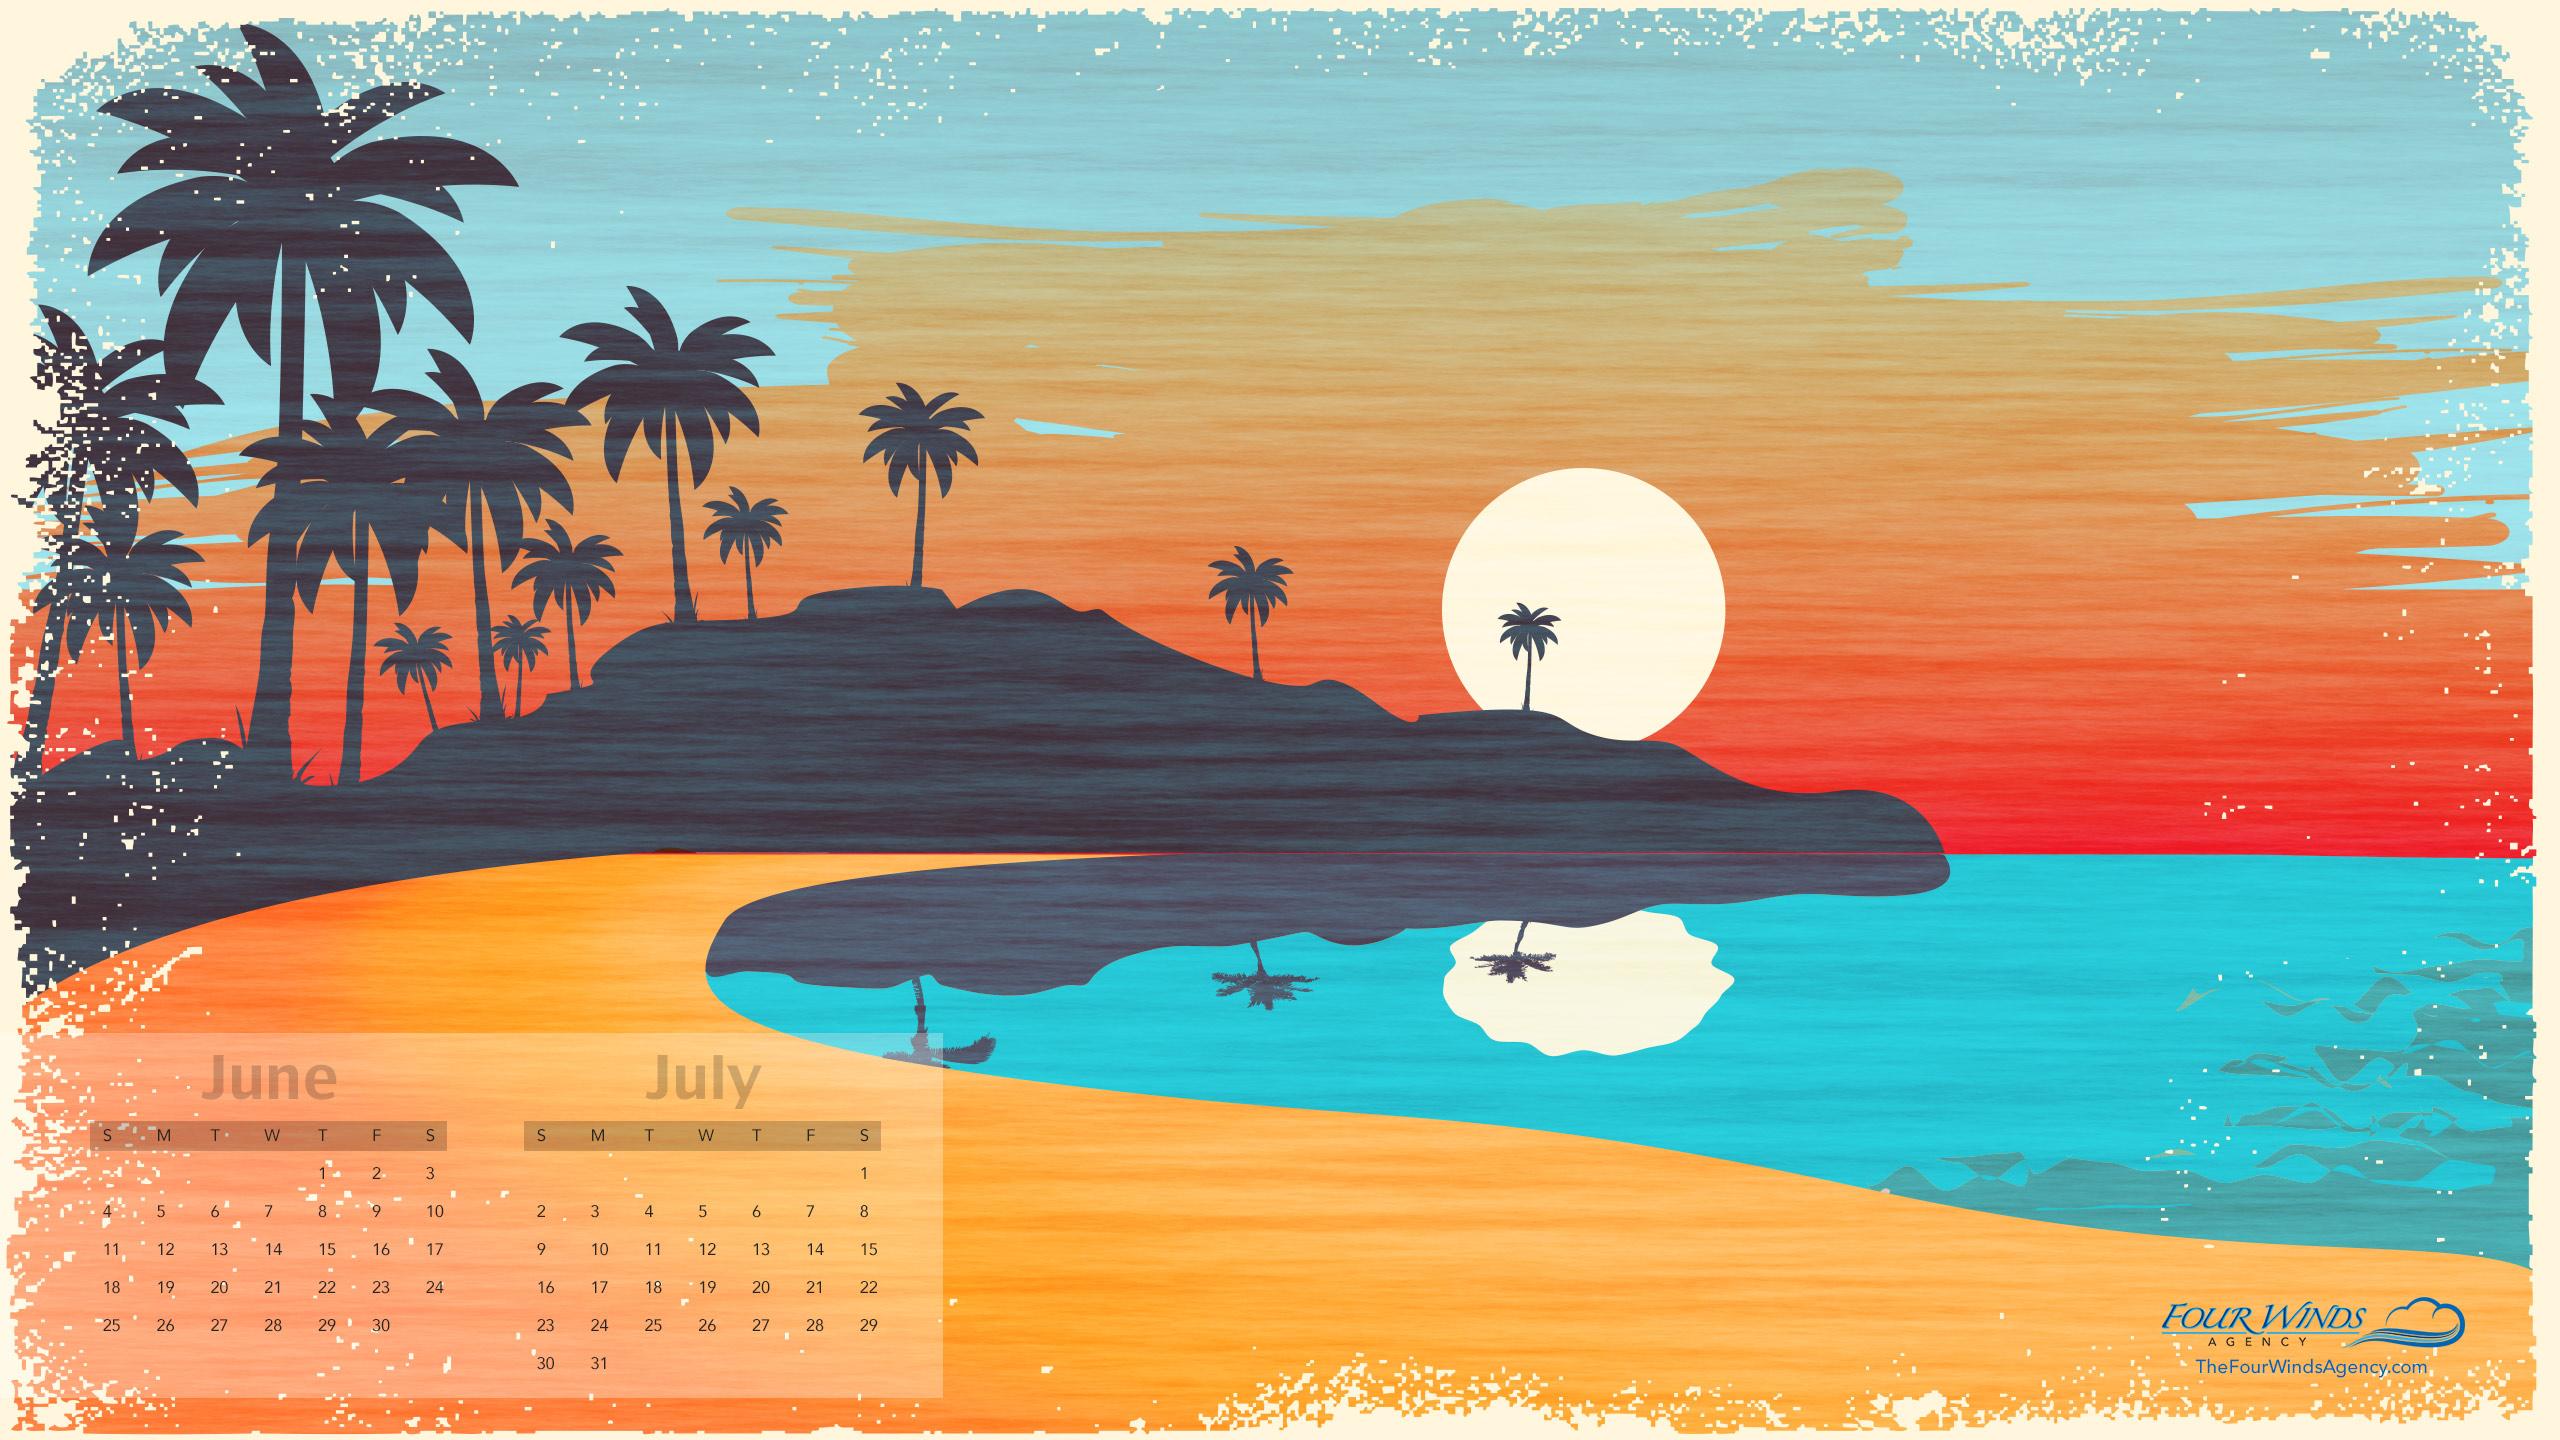 Desktop Wallpaper Calendar June July 2017 Four Winds Agency 2560x1440